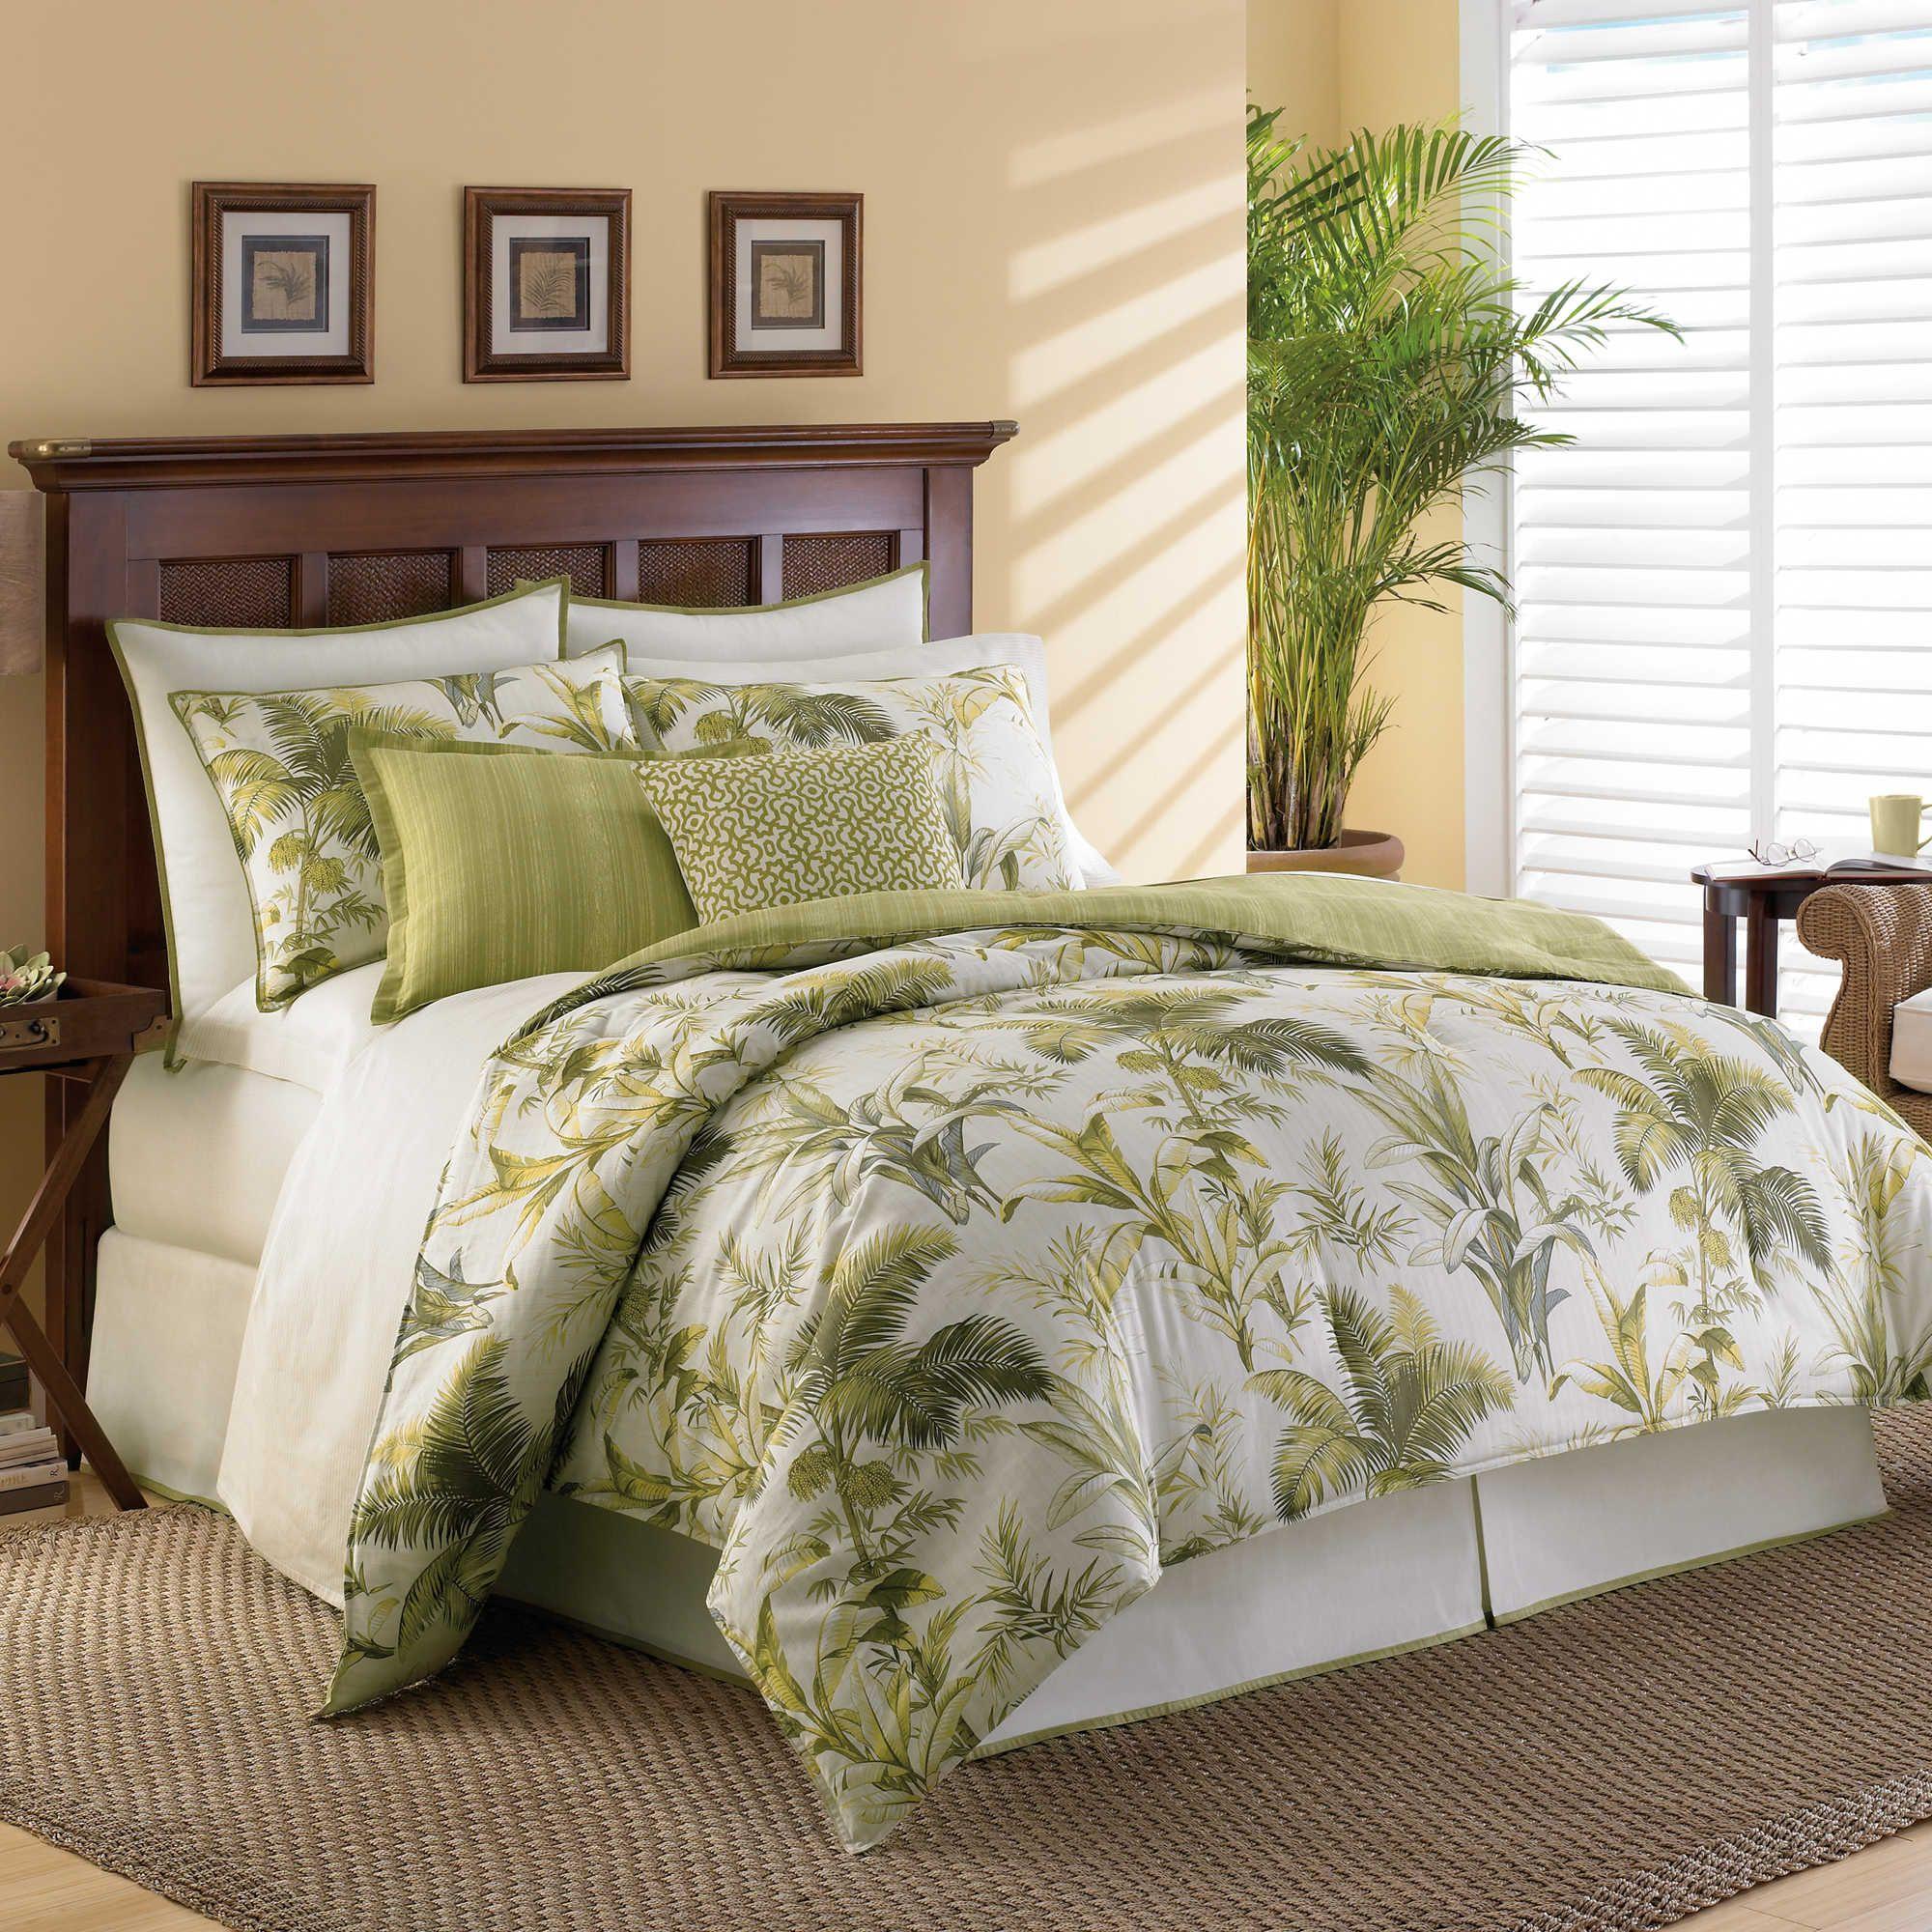 Tommy Bahama Bedding Sets.Tommy Bahama Home Island Botanical Comforter Set Tropical